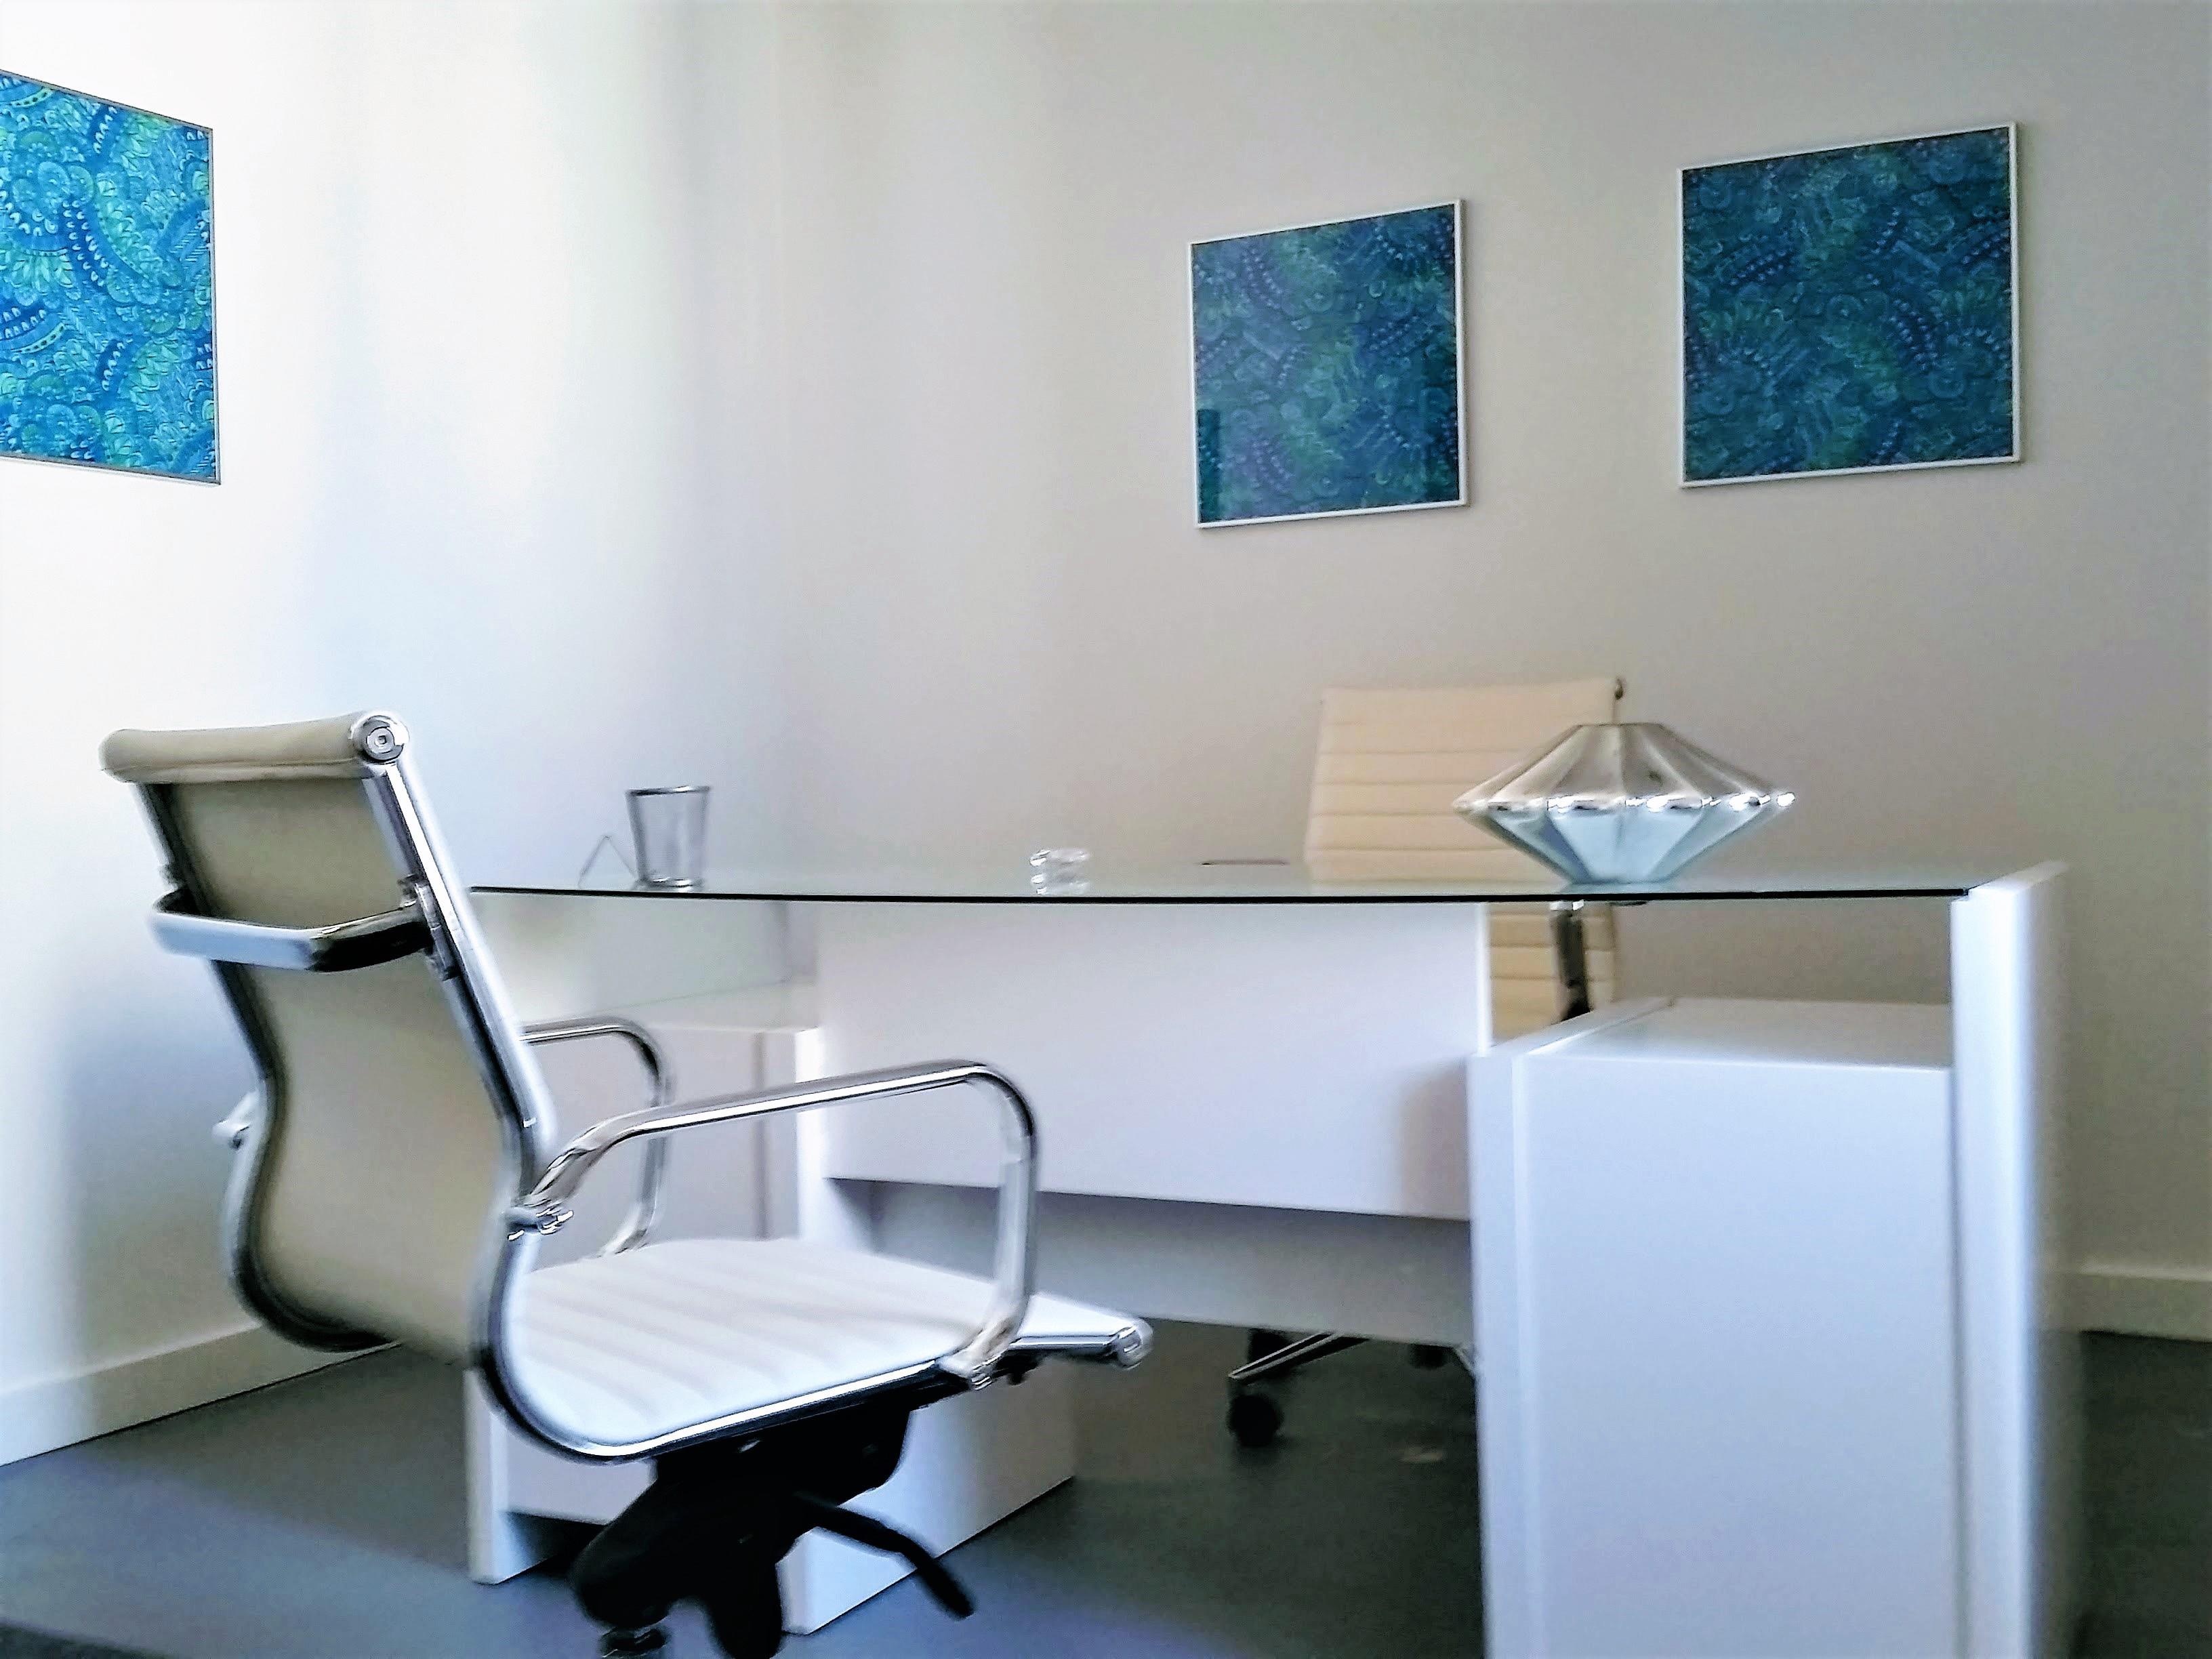 mindwarehouse - Suite 901